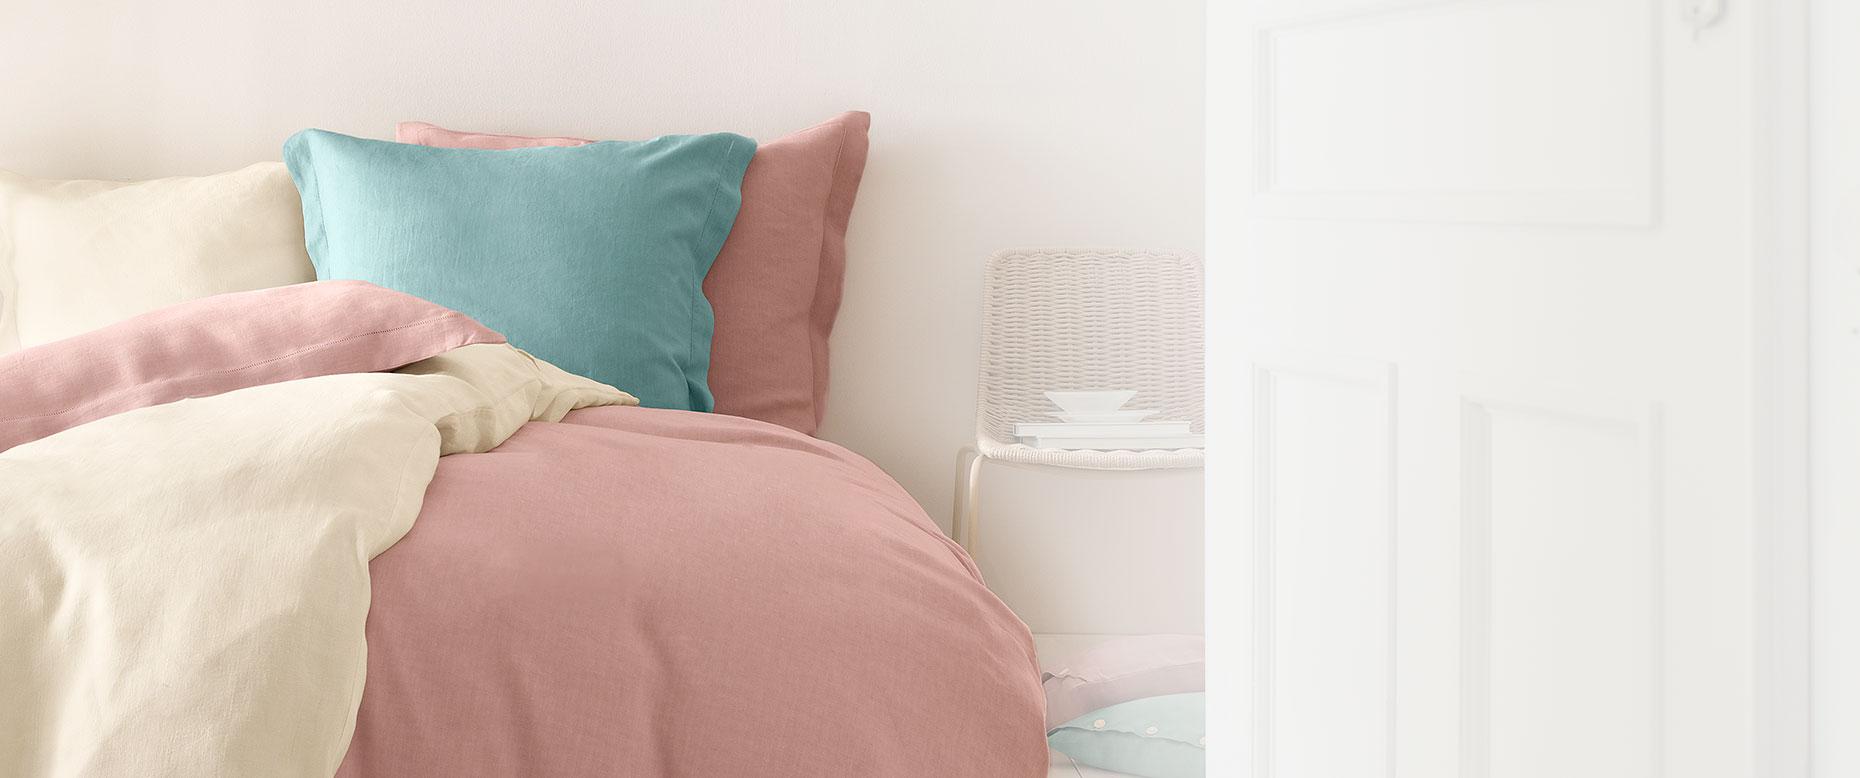 test kopfkissen 80x80 kleiderschr nke m bel rogg moderne. Black Bedroom Furniture Sets. Home Design Ideas